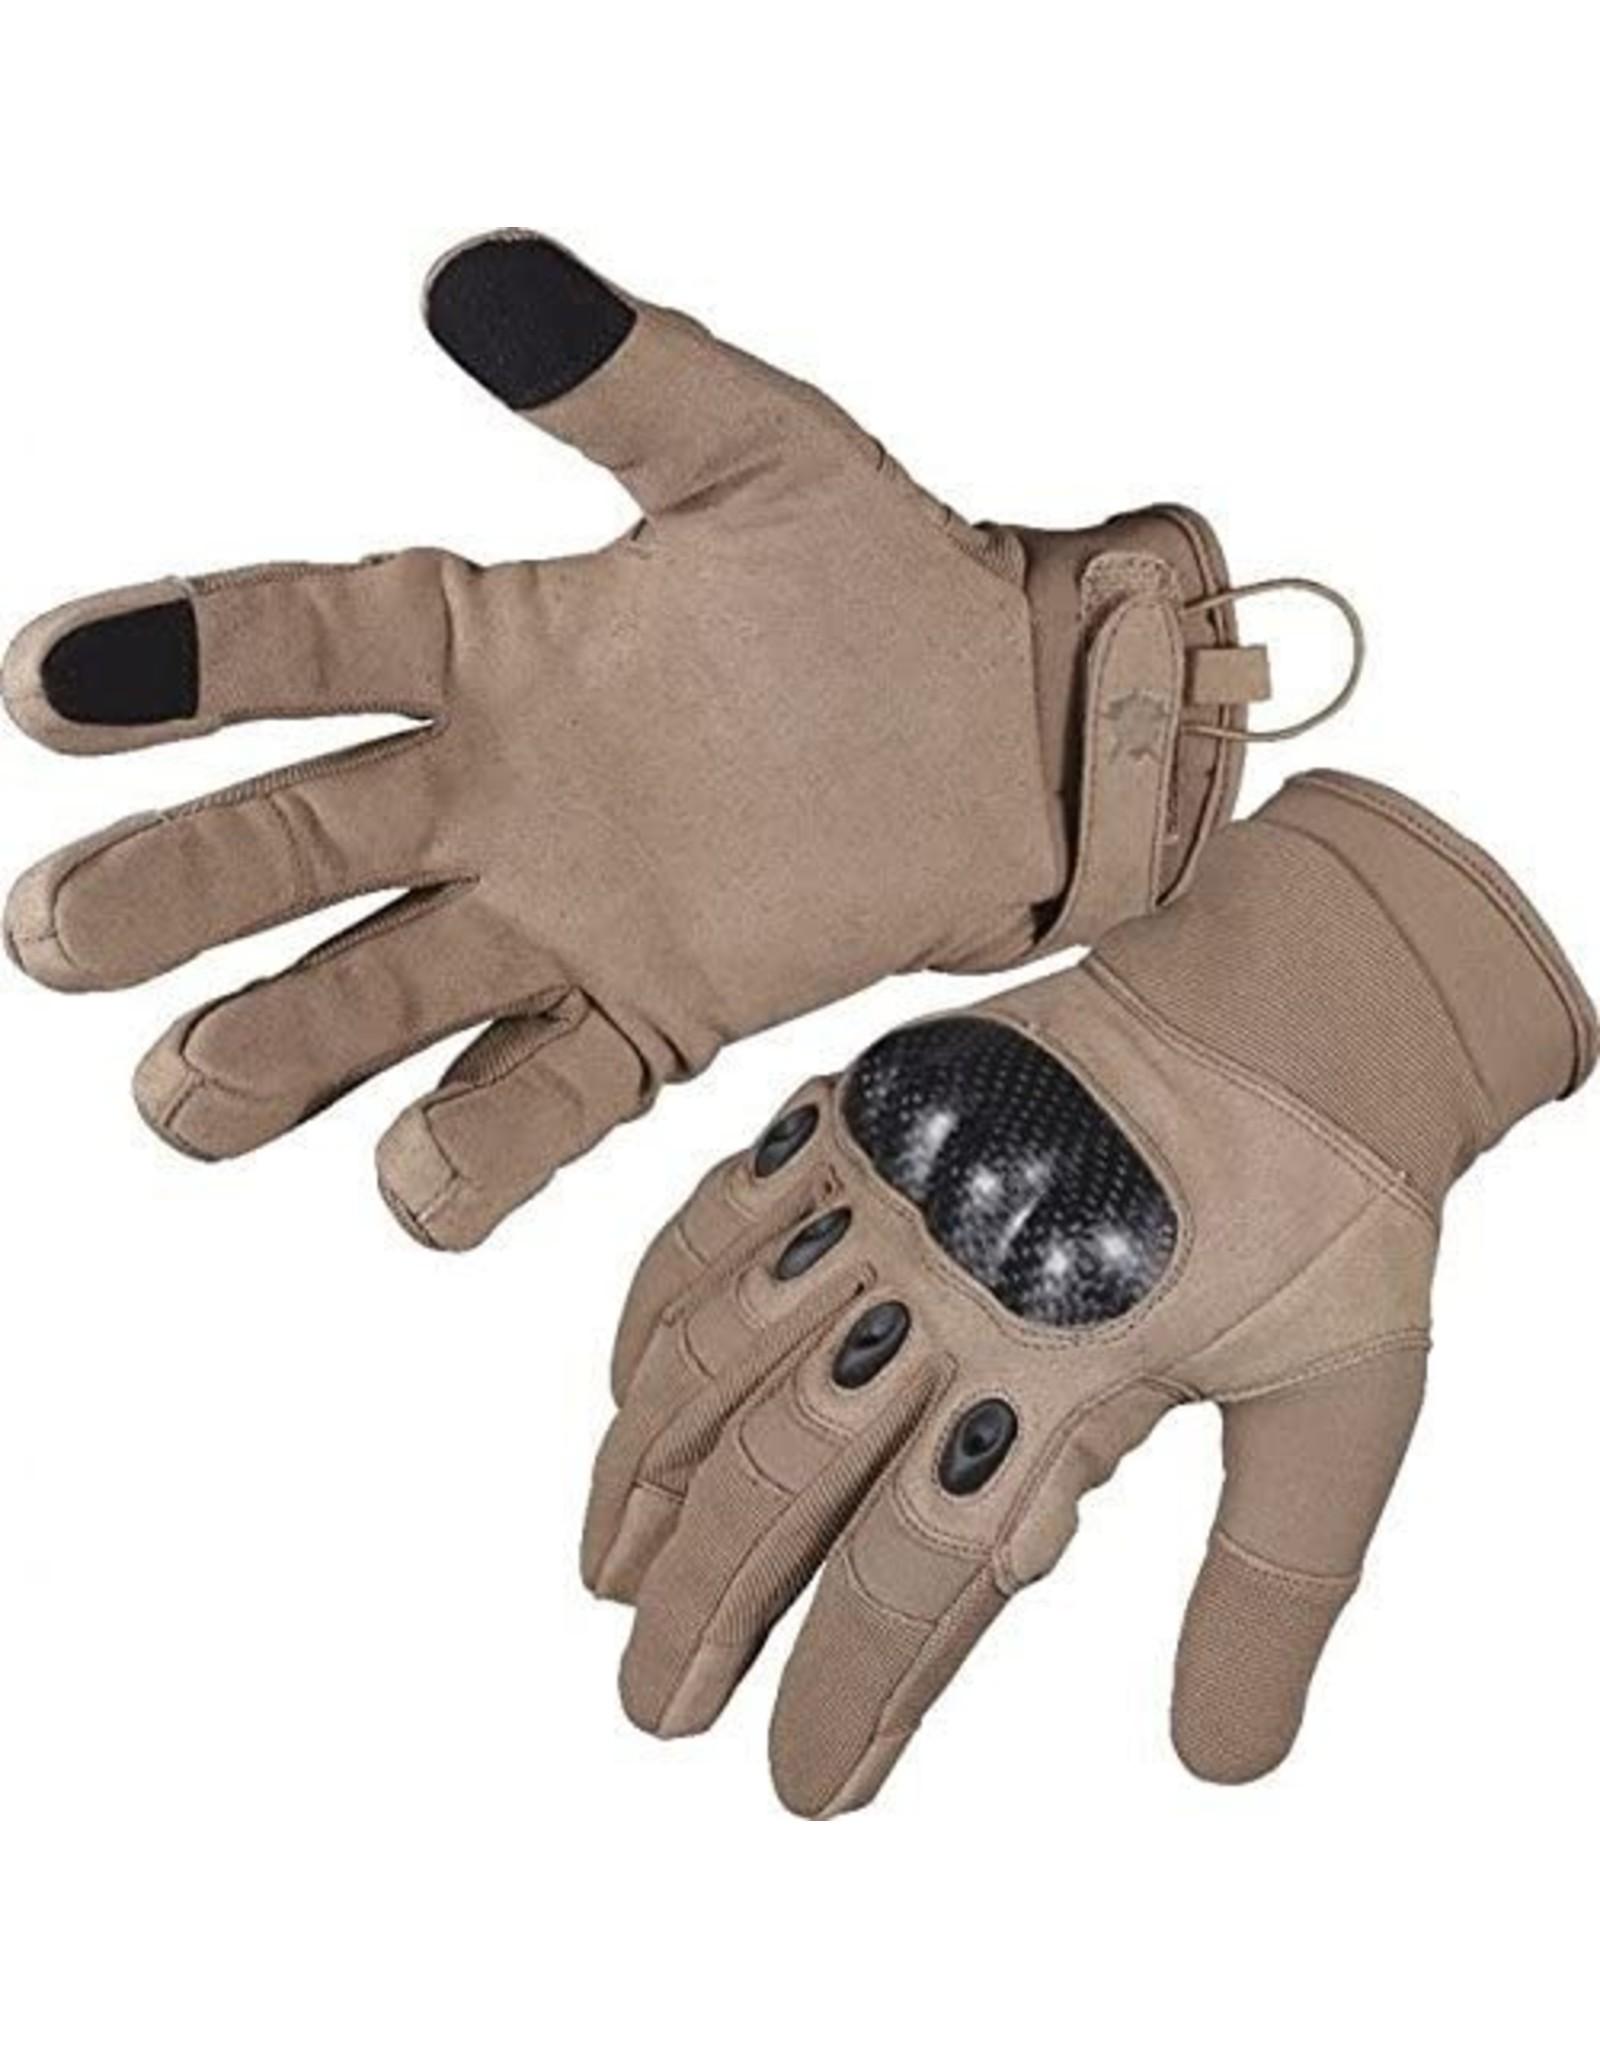 5IVE STAR GEAR Tactical Hard Knuckle Glove